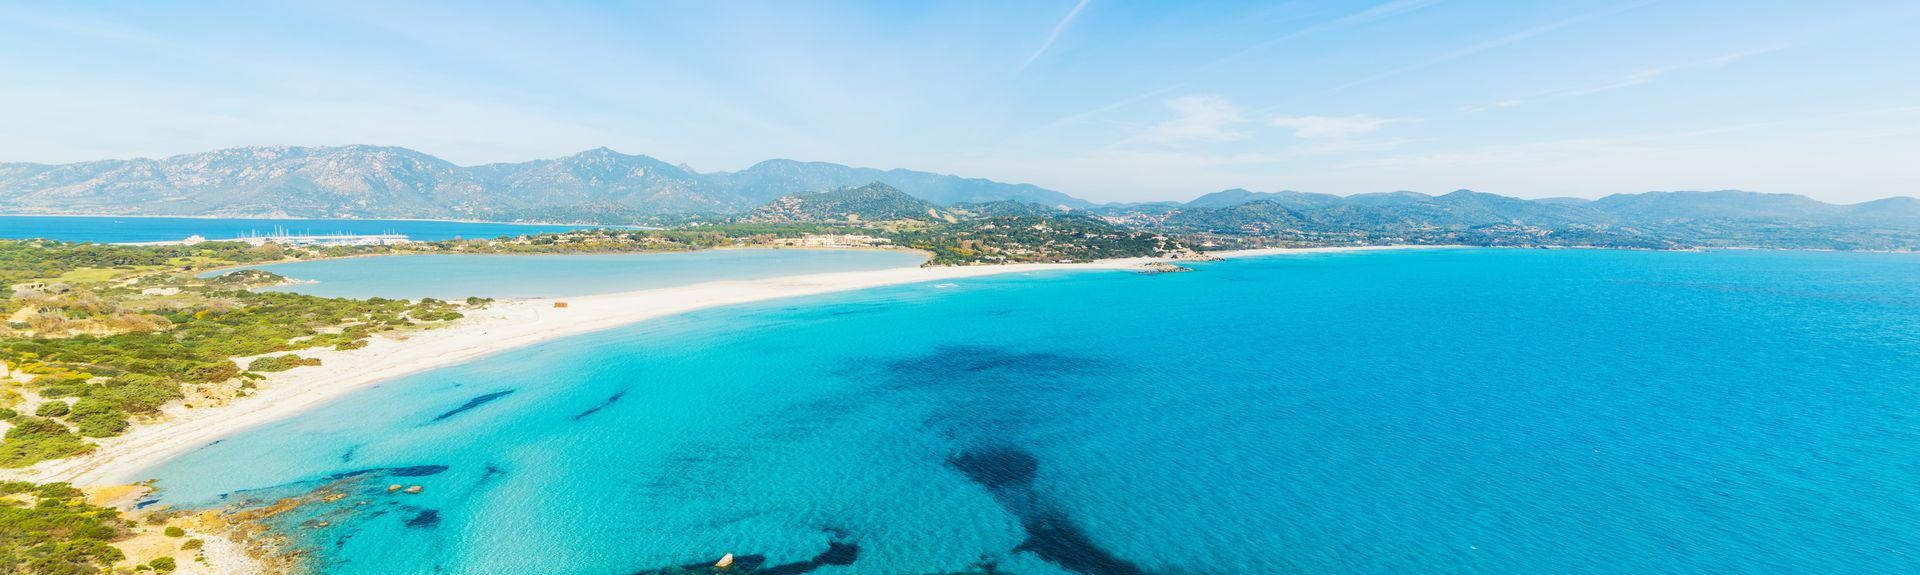 Sant'Elmo, Sardegna, Italia